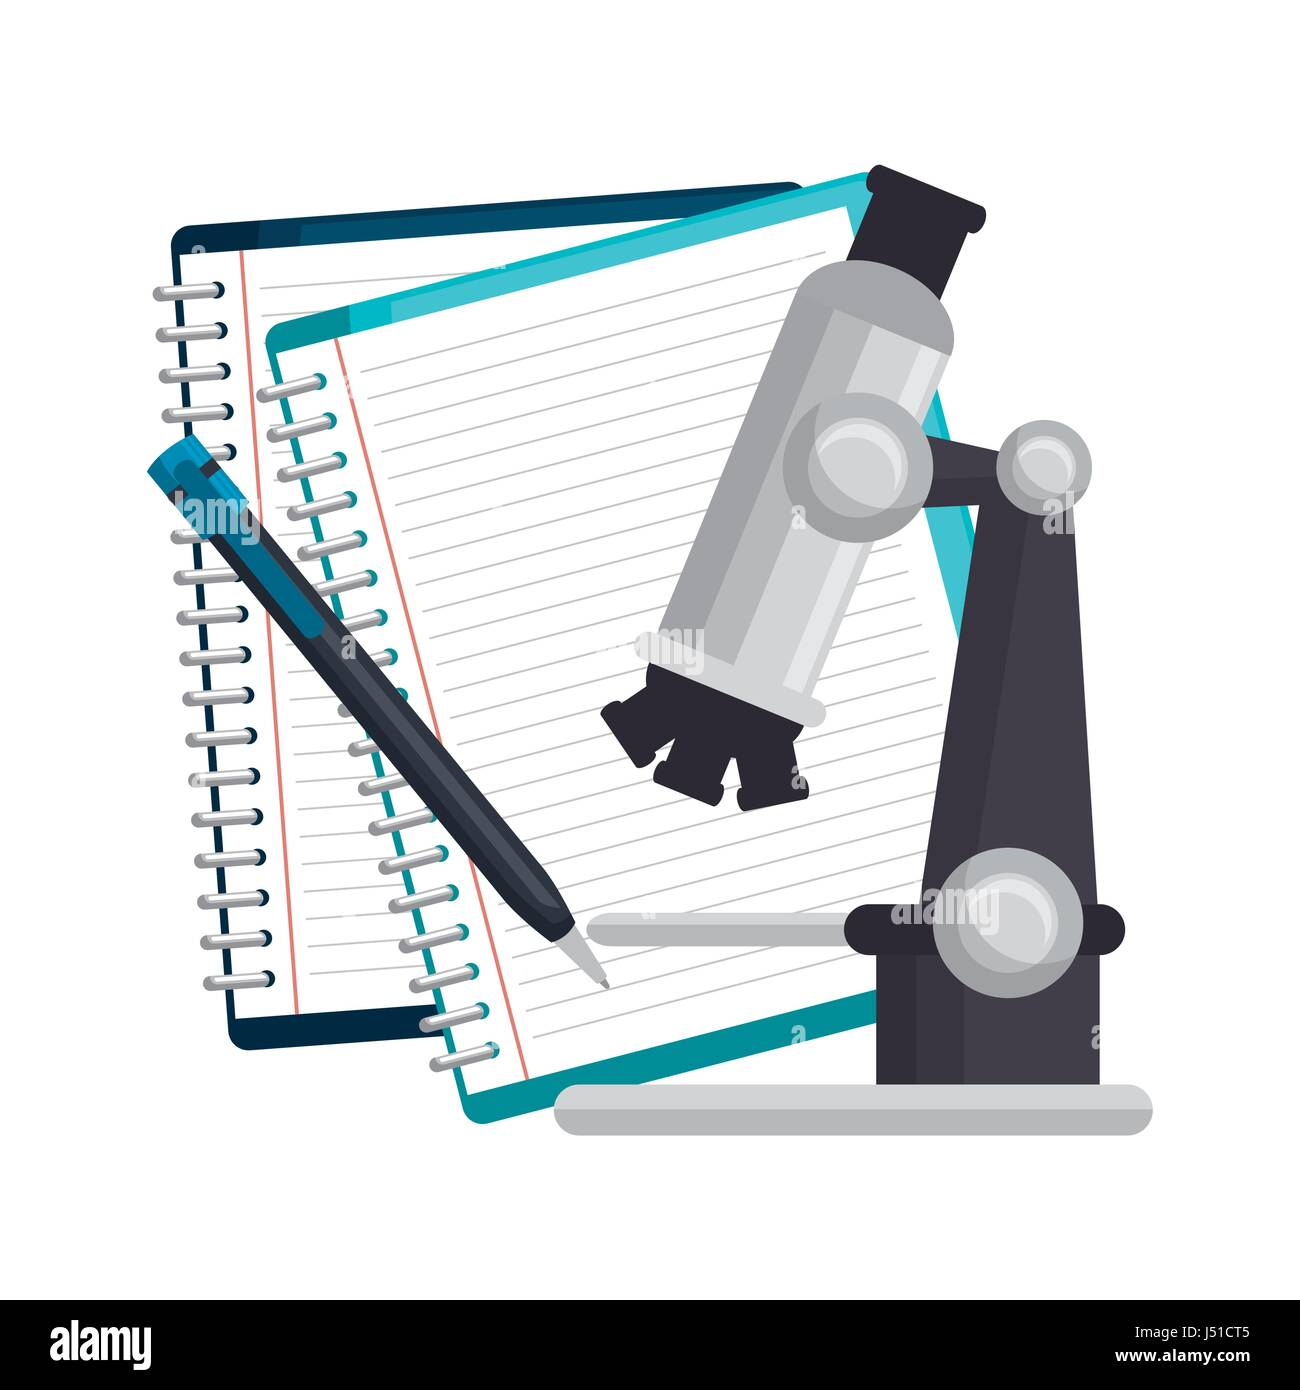 Study books design - Stock Vector